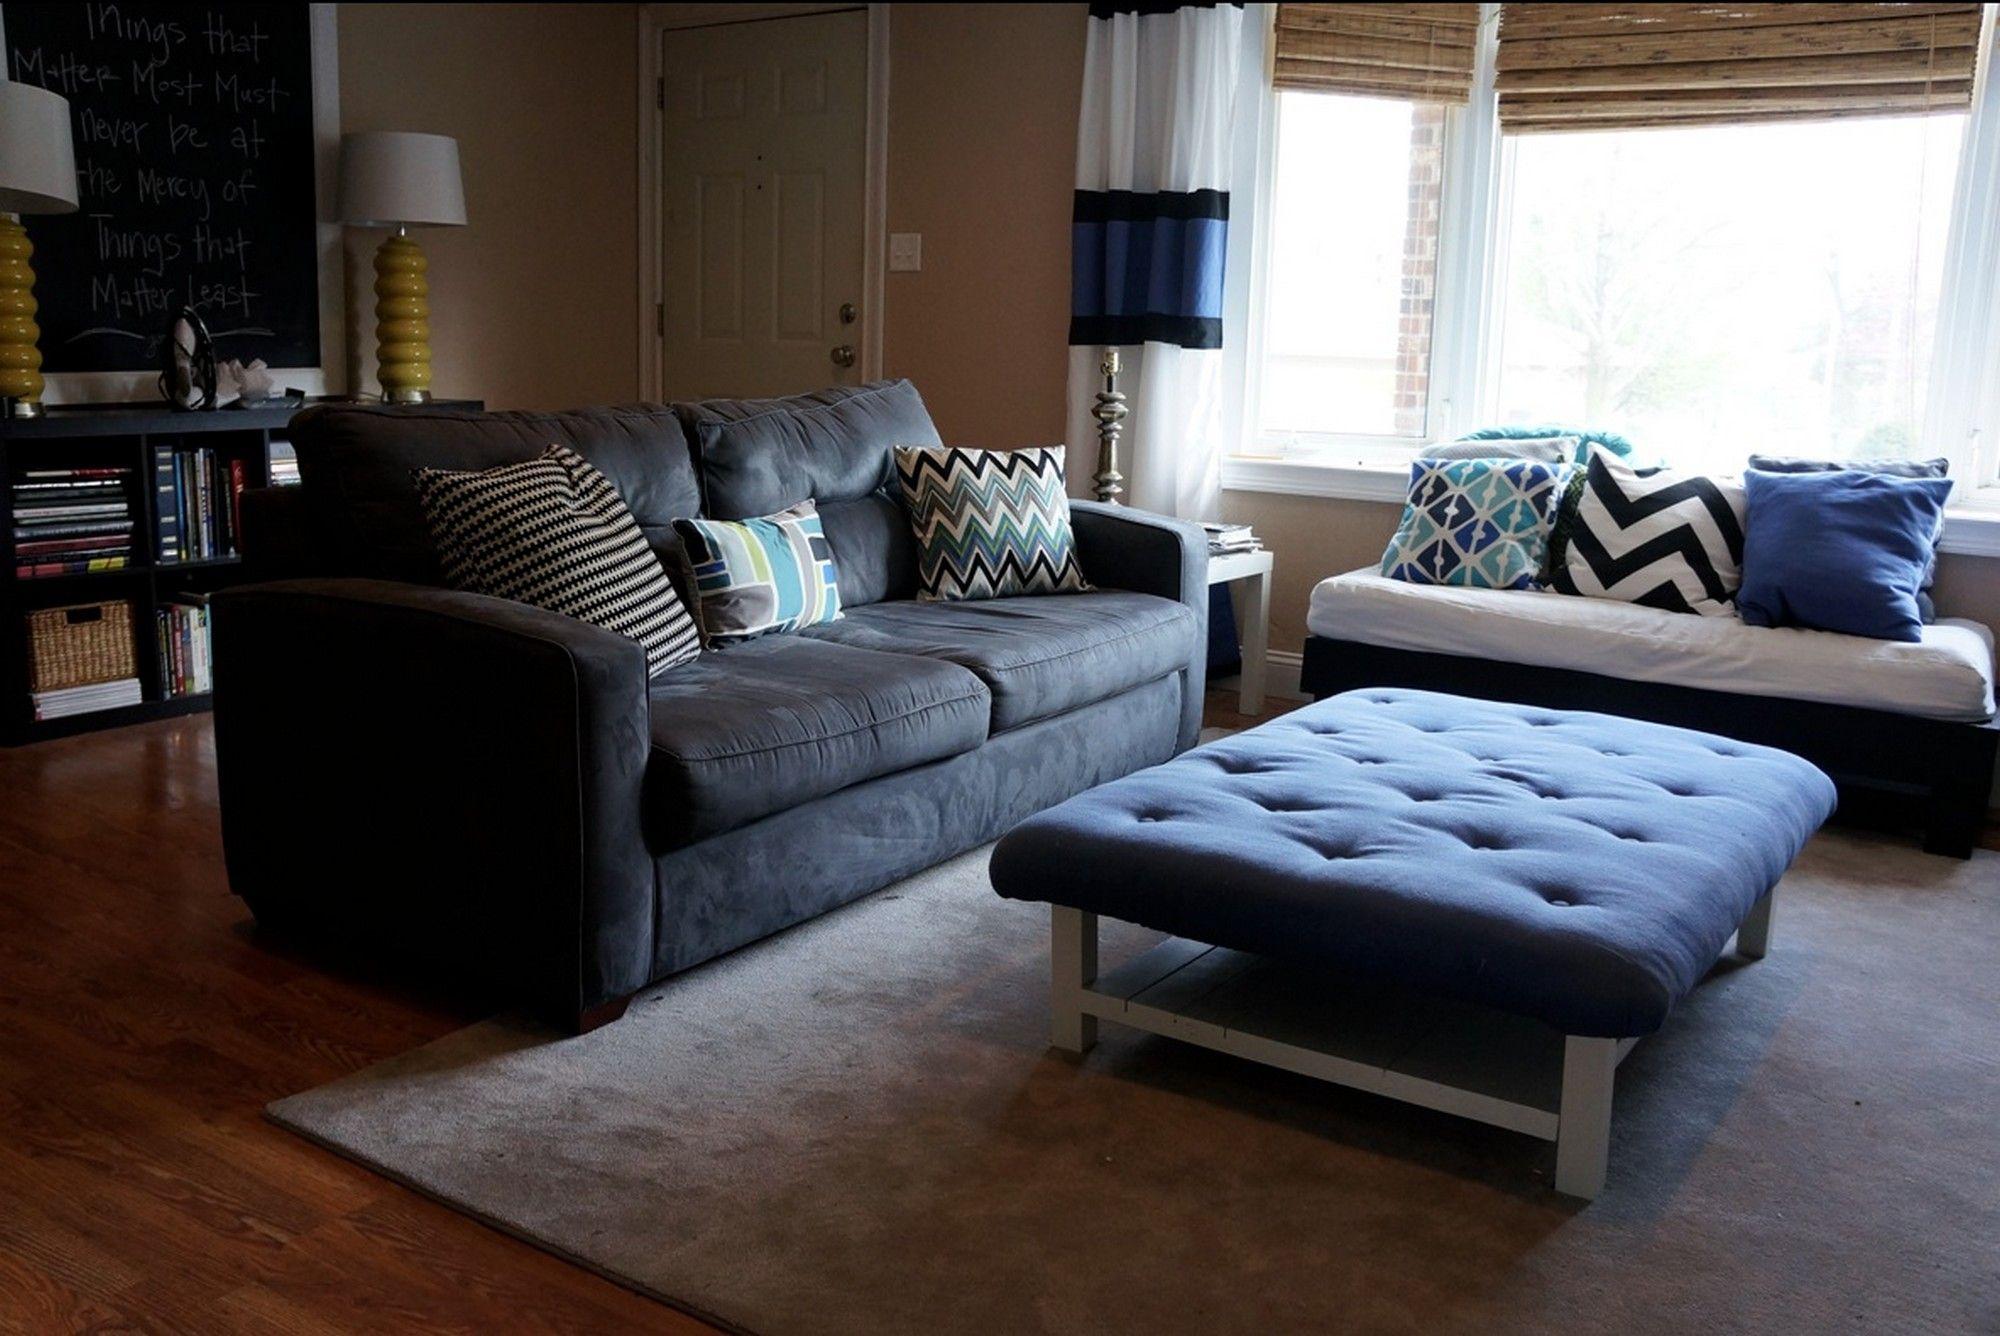 ottoman coffee table modern | Minimalist Home Design | Pinterest